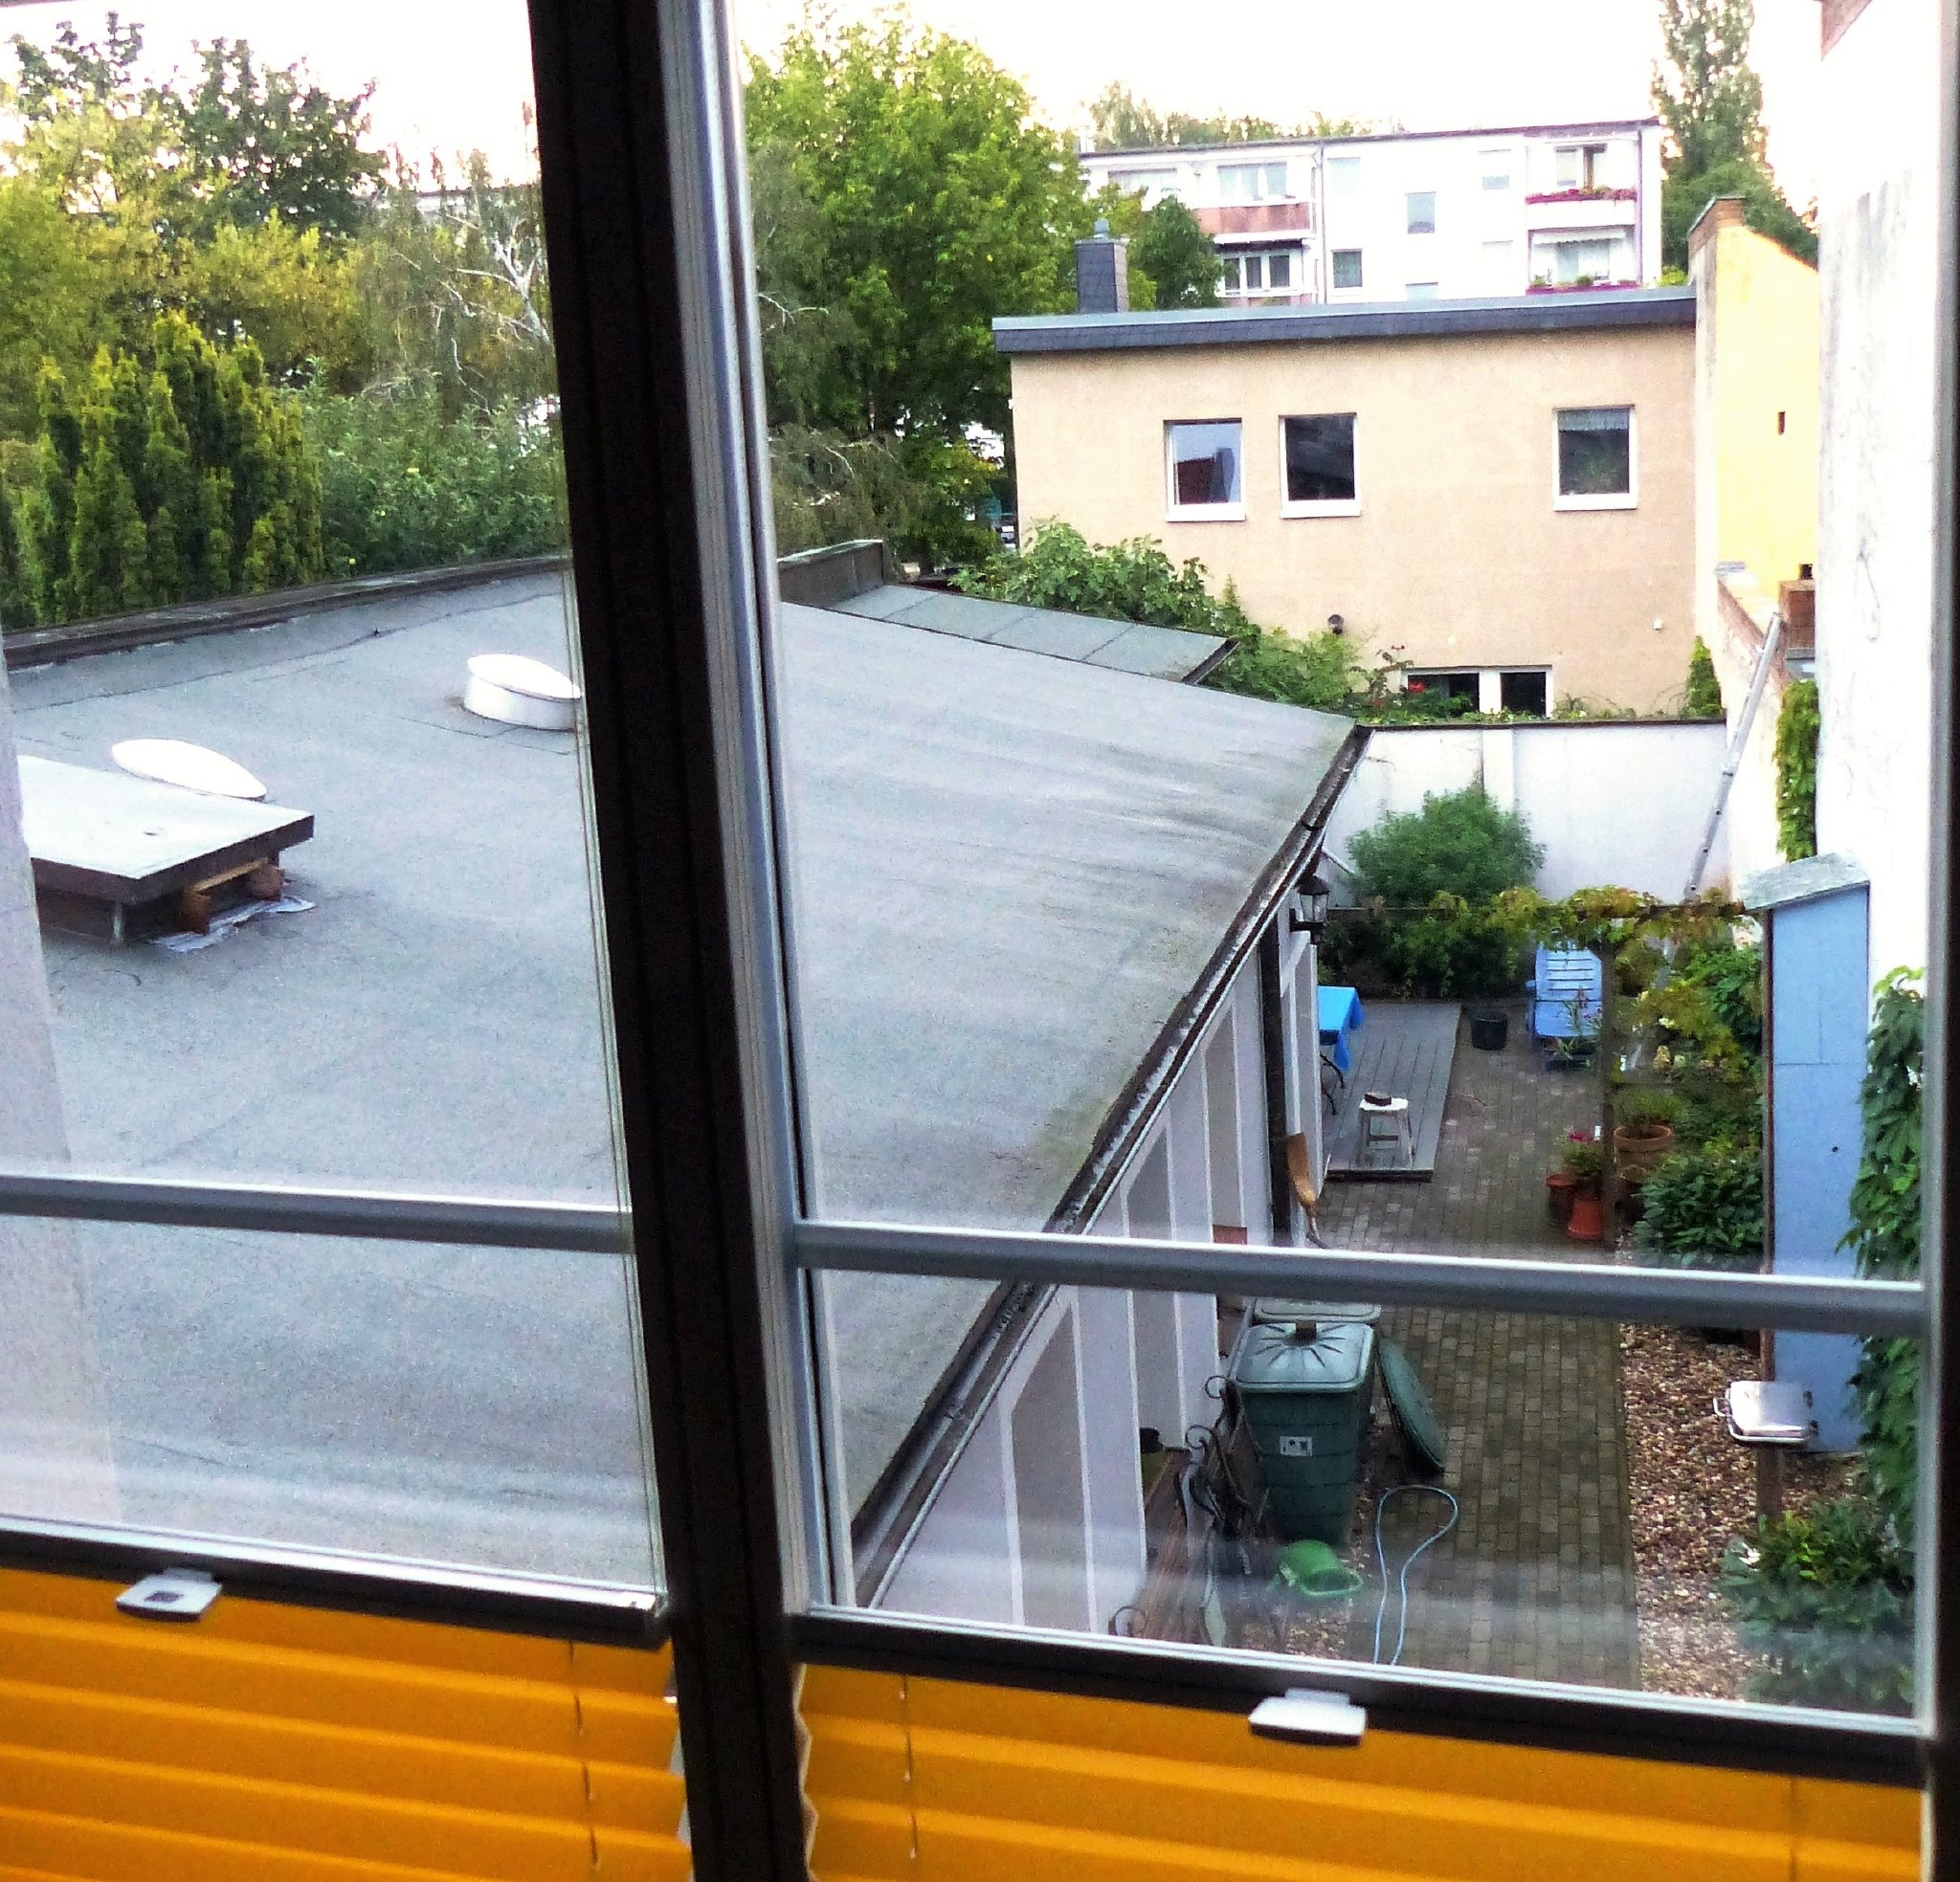 ferienwohnung reusch in berlin treptow k penick carl reusch. Black Bedroom Furniture Sets. Home Design Ideas